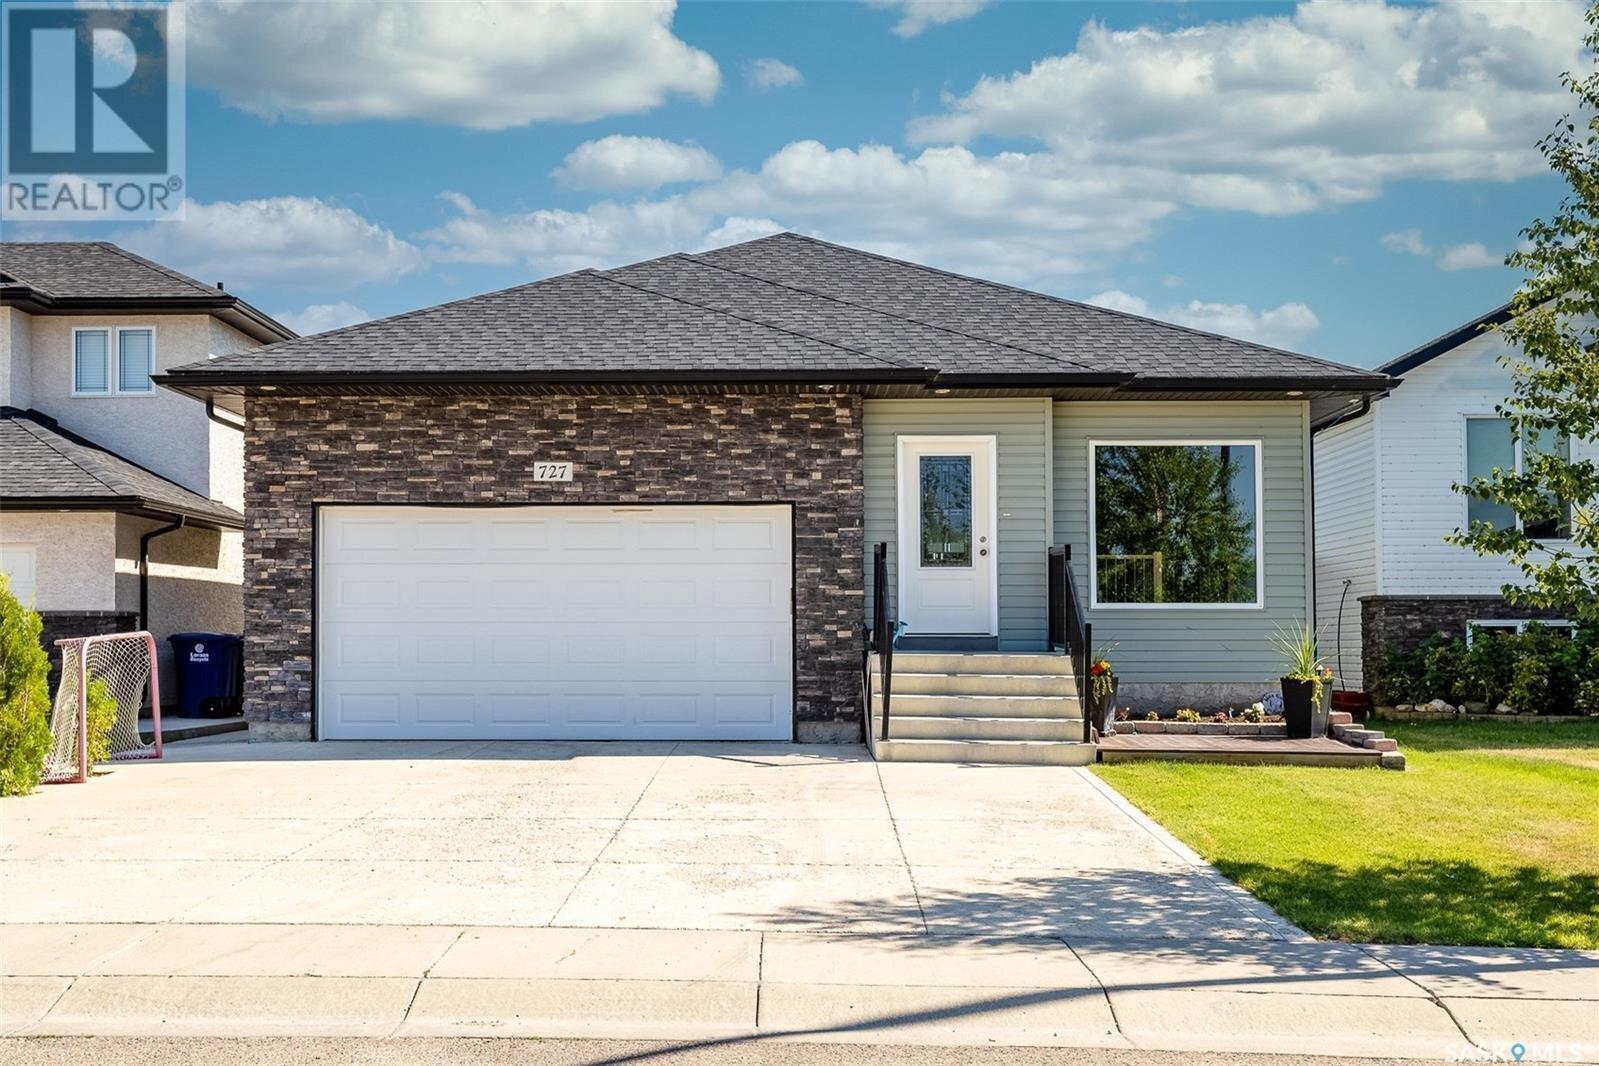 House for sale at 727 Padget Cres Saskatoon Saskatchewan - MLS: SK838678